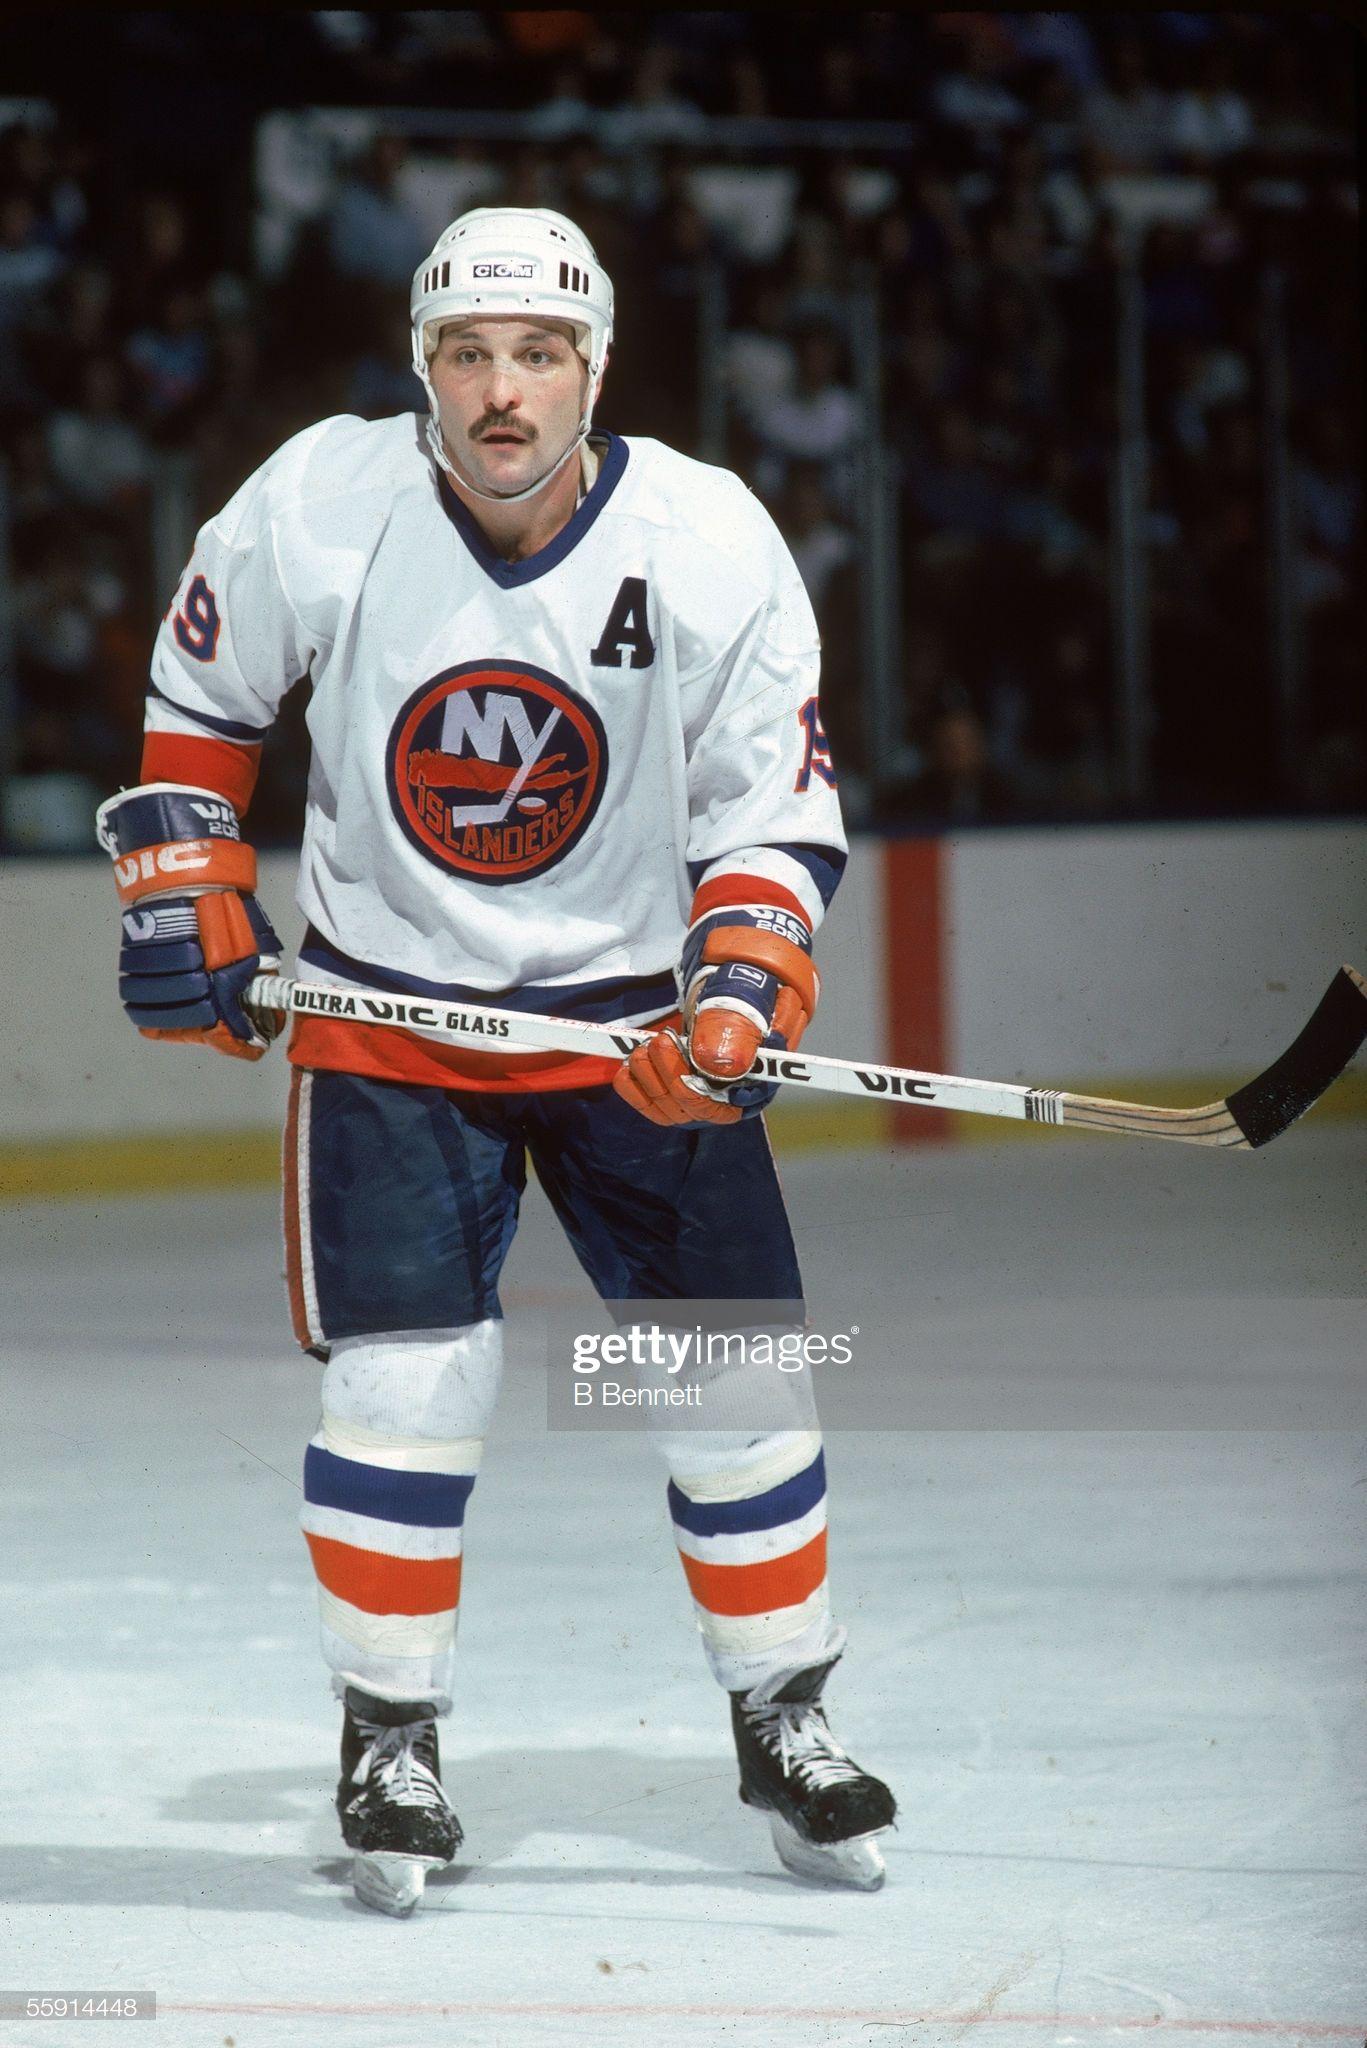 Bryan Trottier Of The New York Islanders Skates On The Ice During An New York Islanders Nhl Players New York